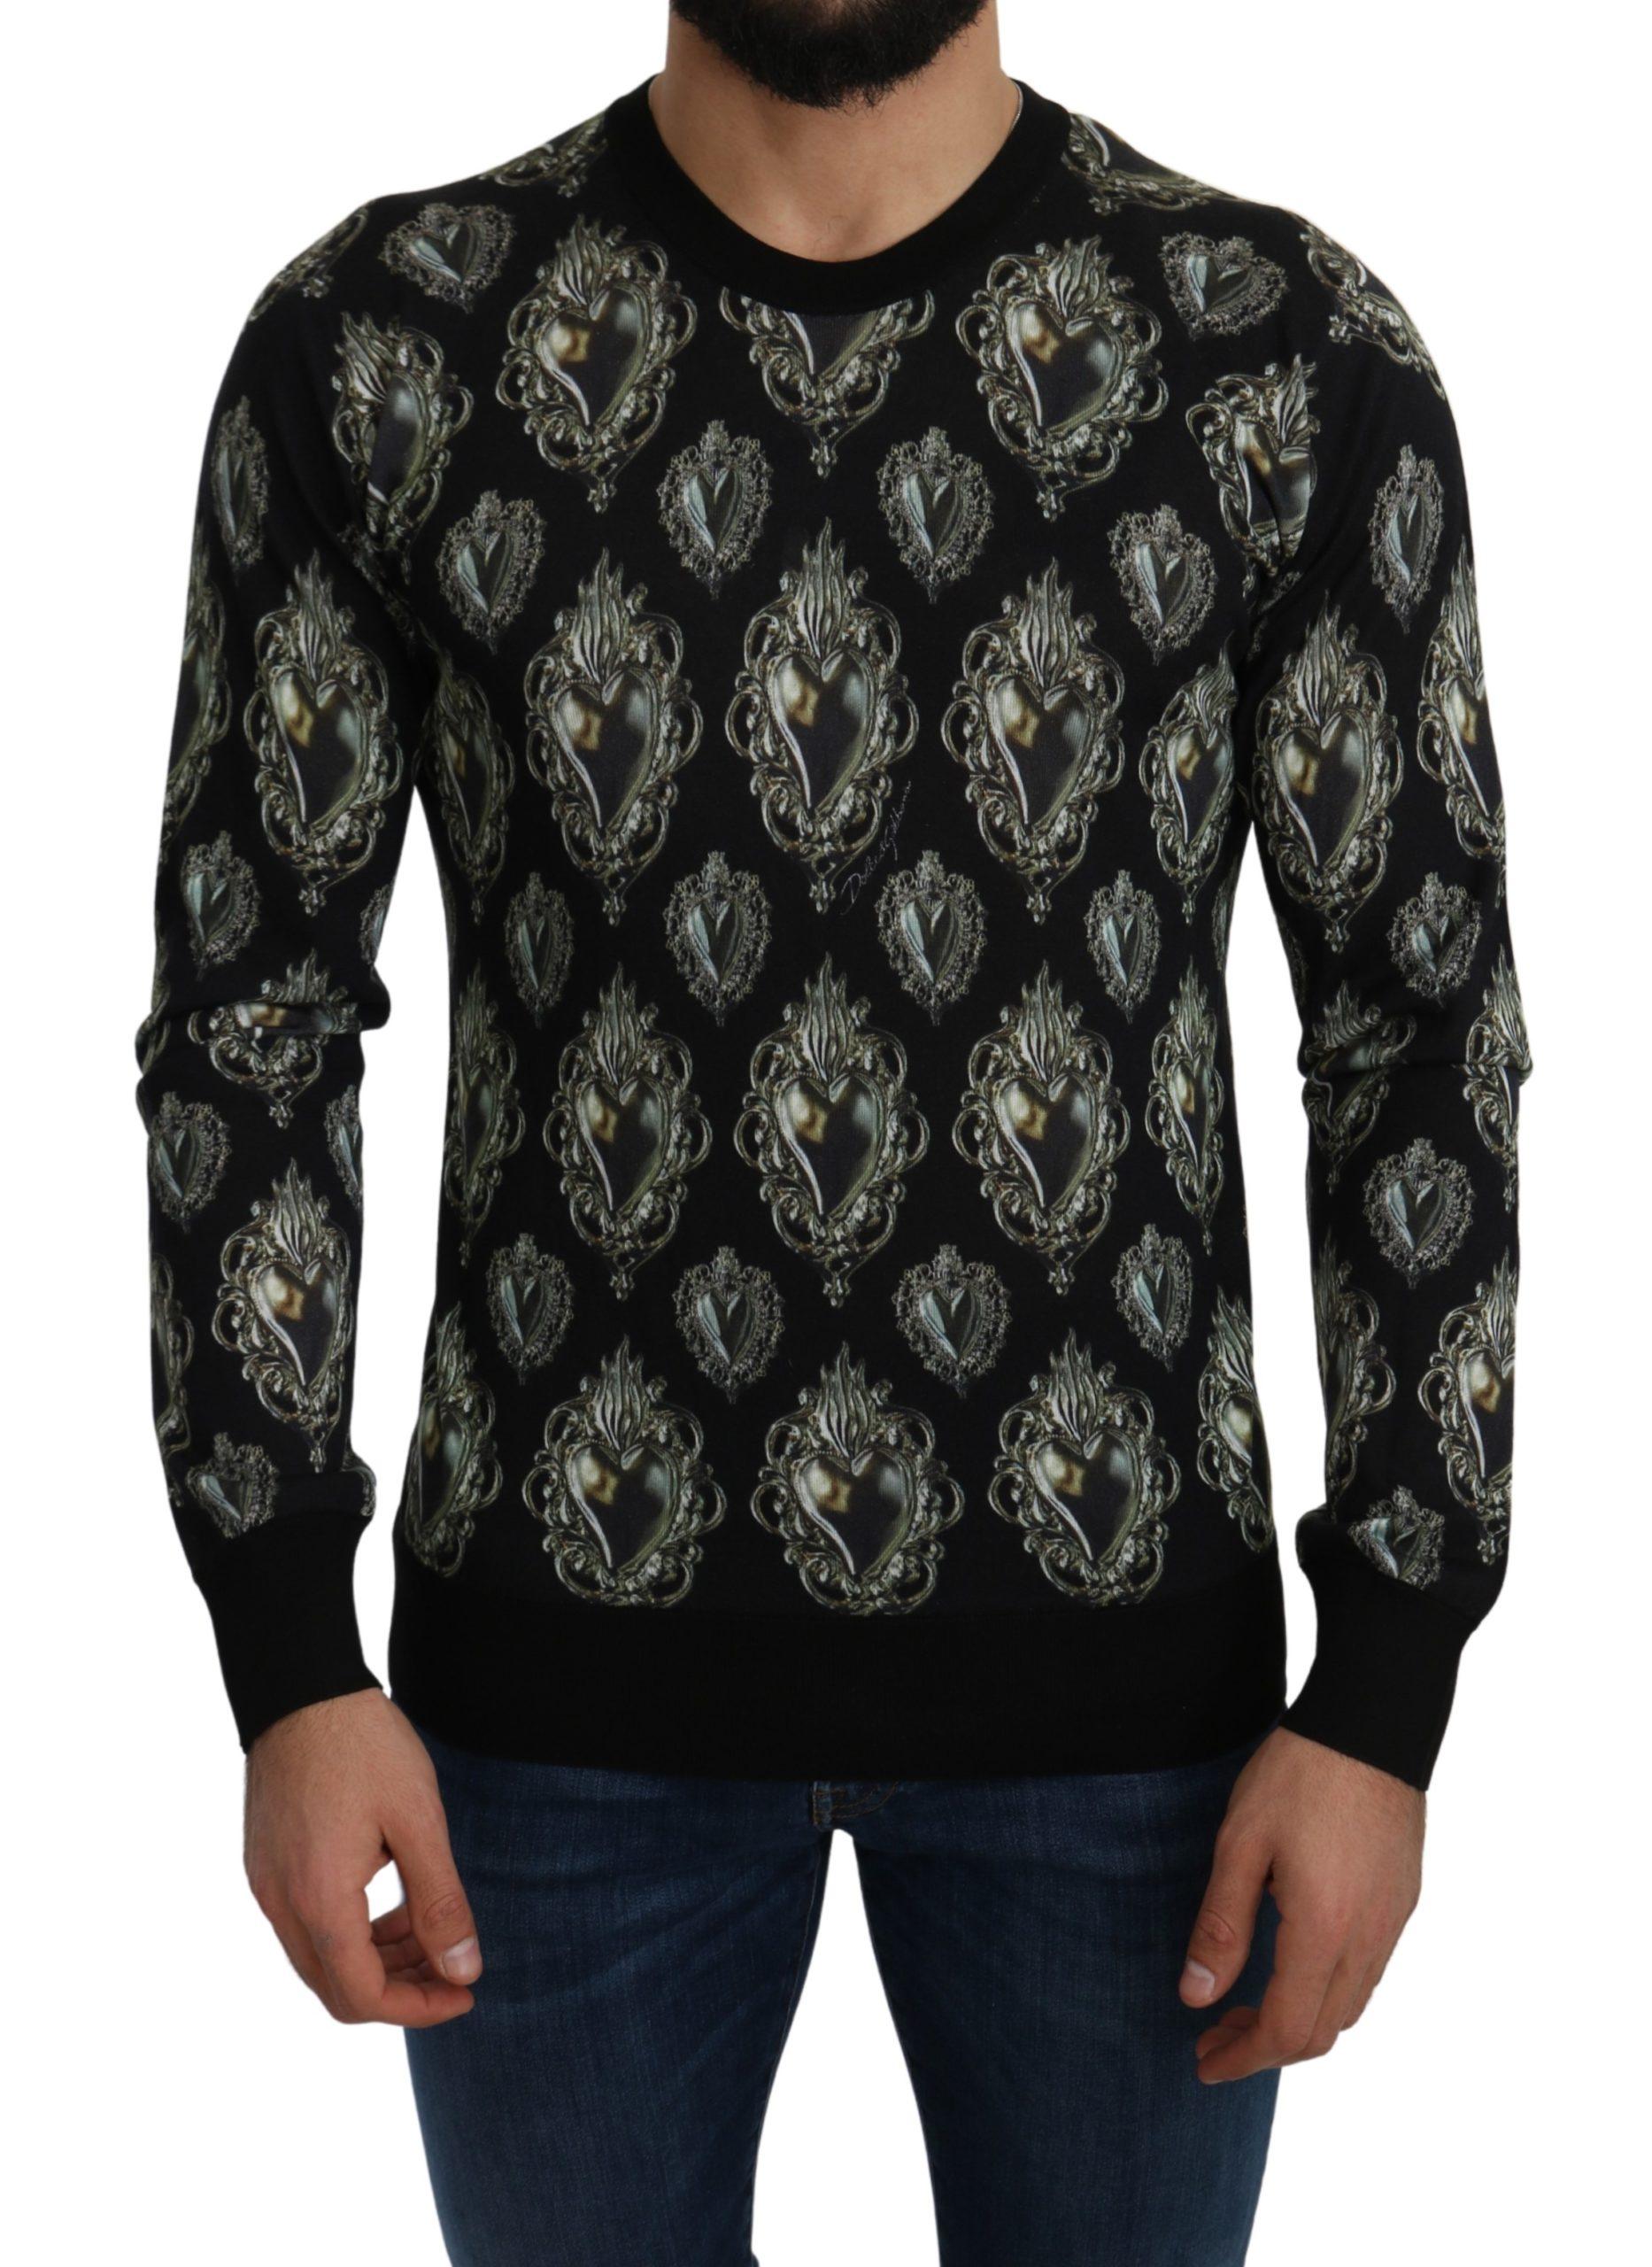 Dolce & Gabbana Women's Silk Heart Pullover Sweater Black TSH5151 - IT52 | XL